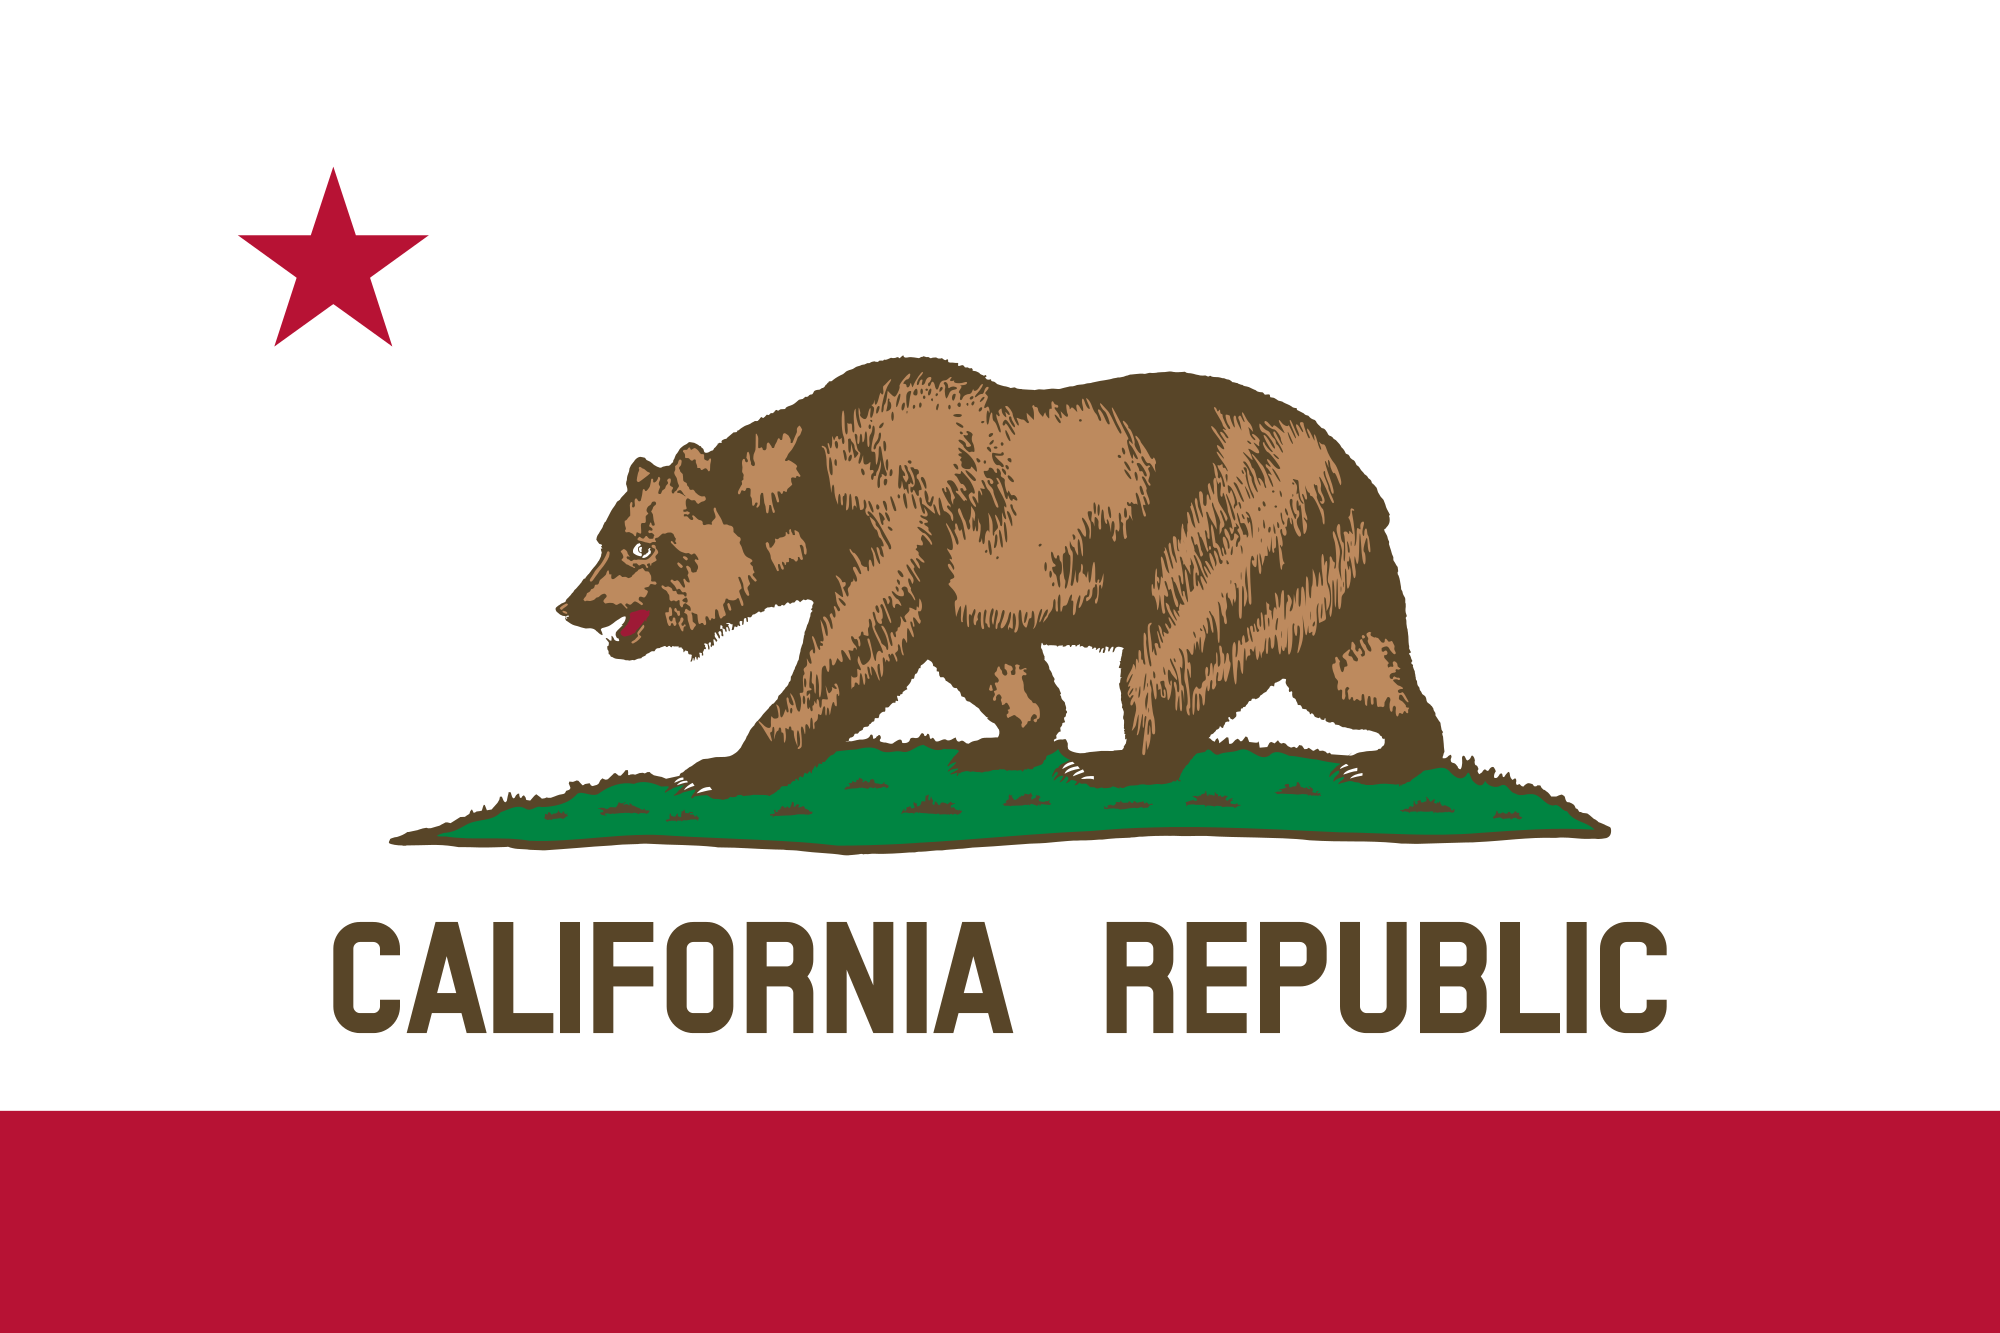 Category:California.